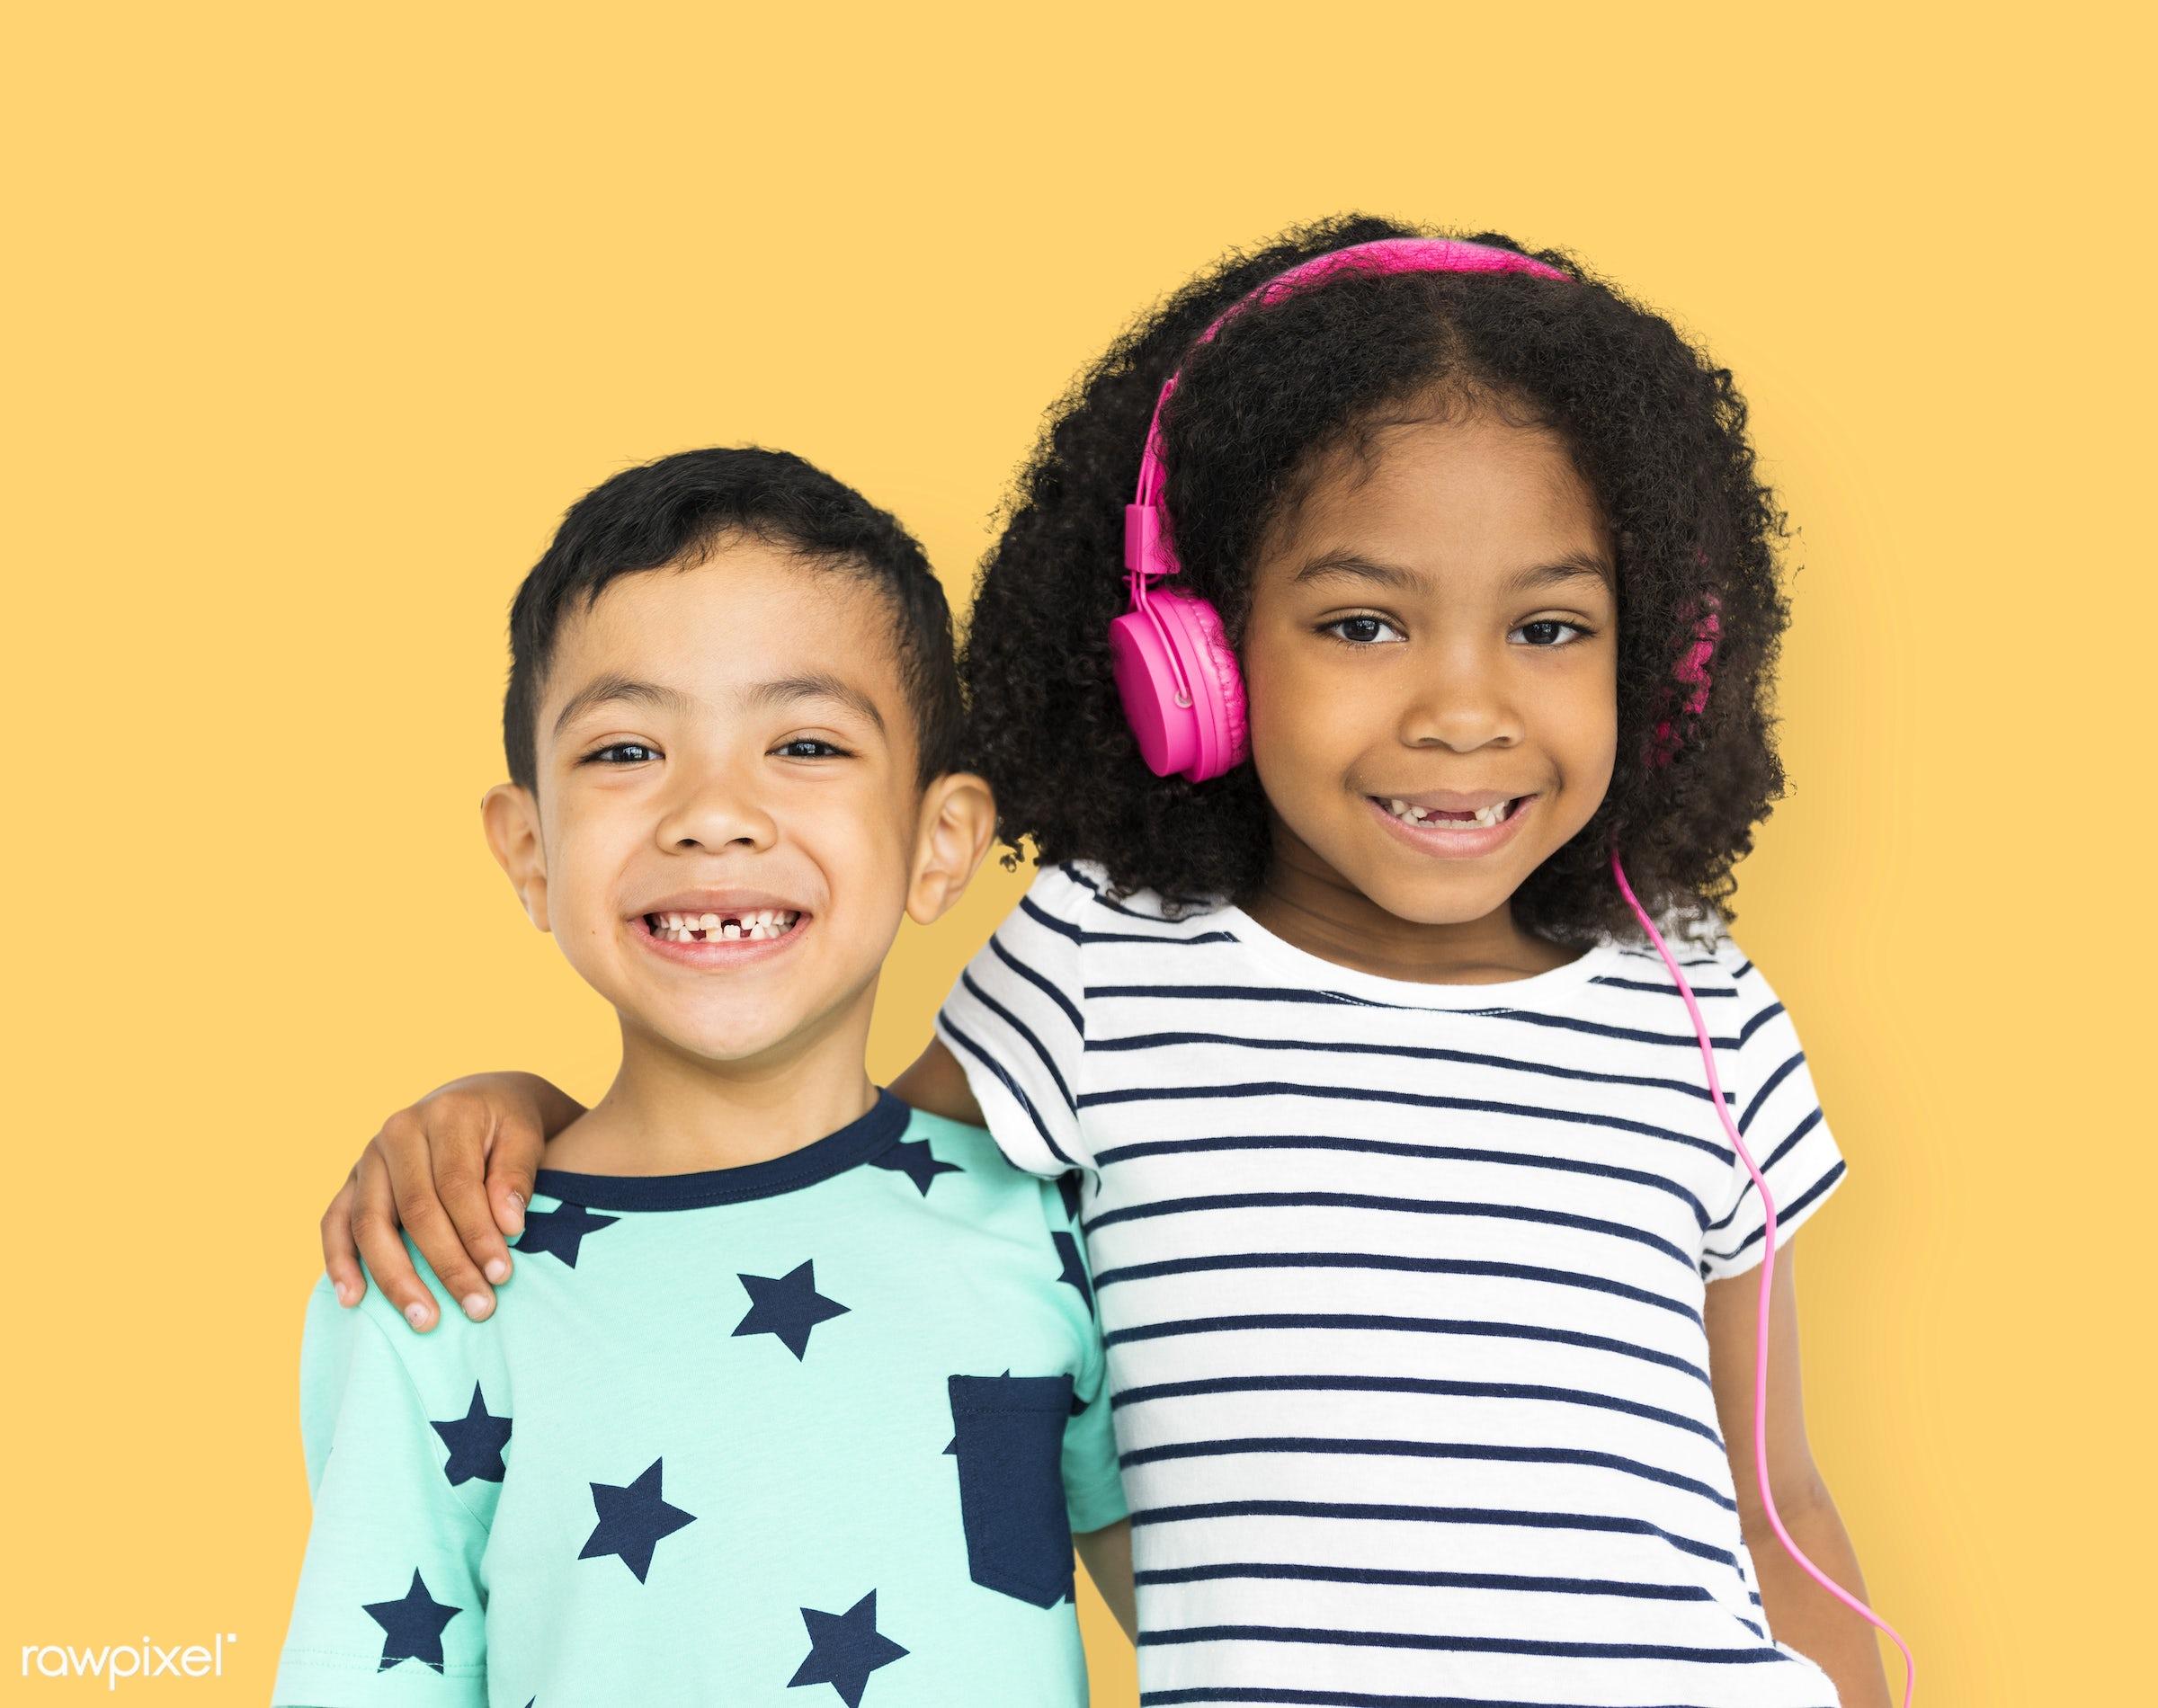 expression, studio, model, person, technology, children, little, cute, people, headphone, kid, sister, friends, friendship,...